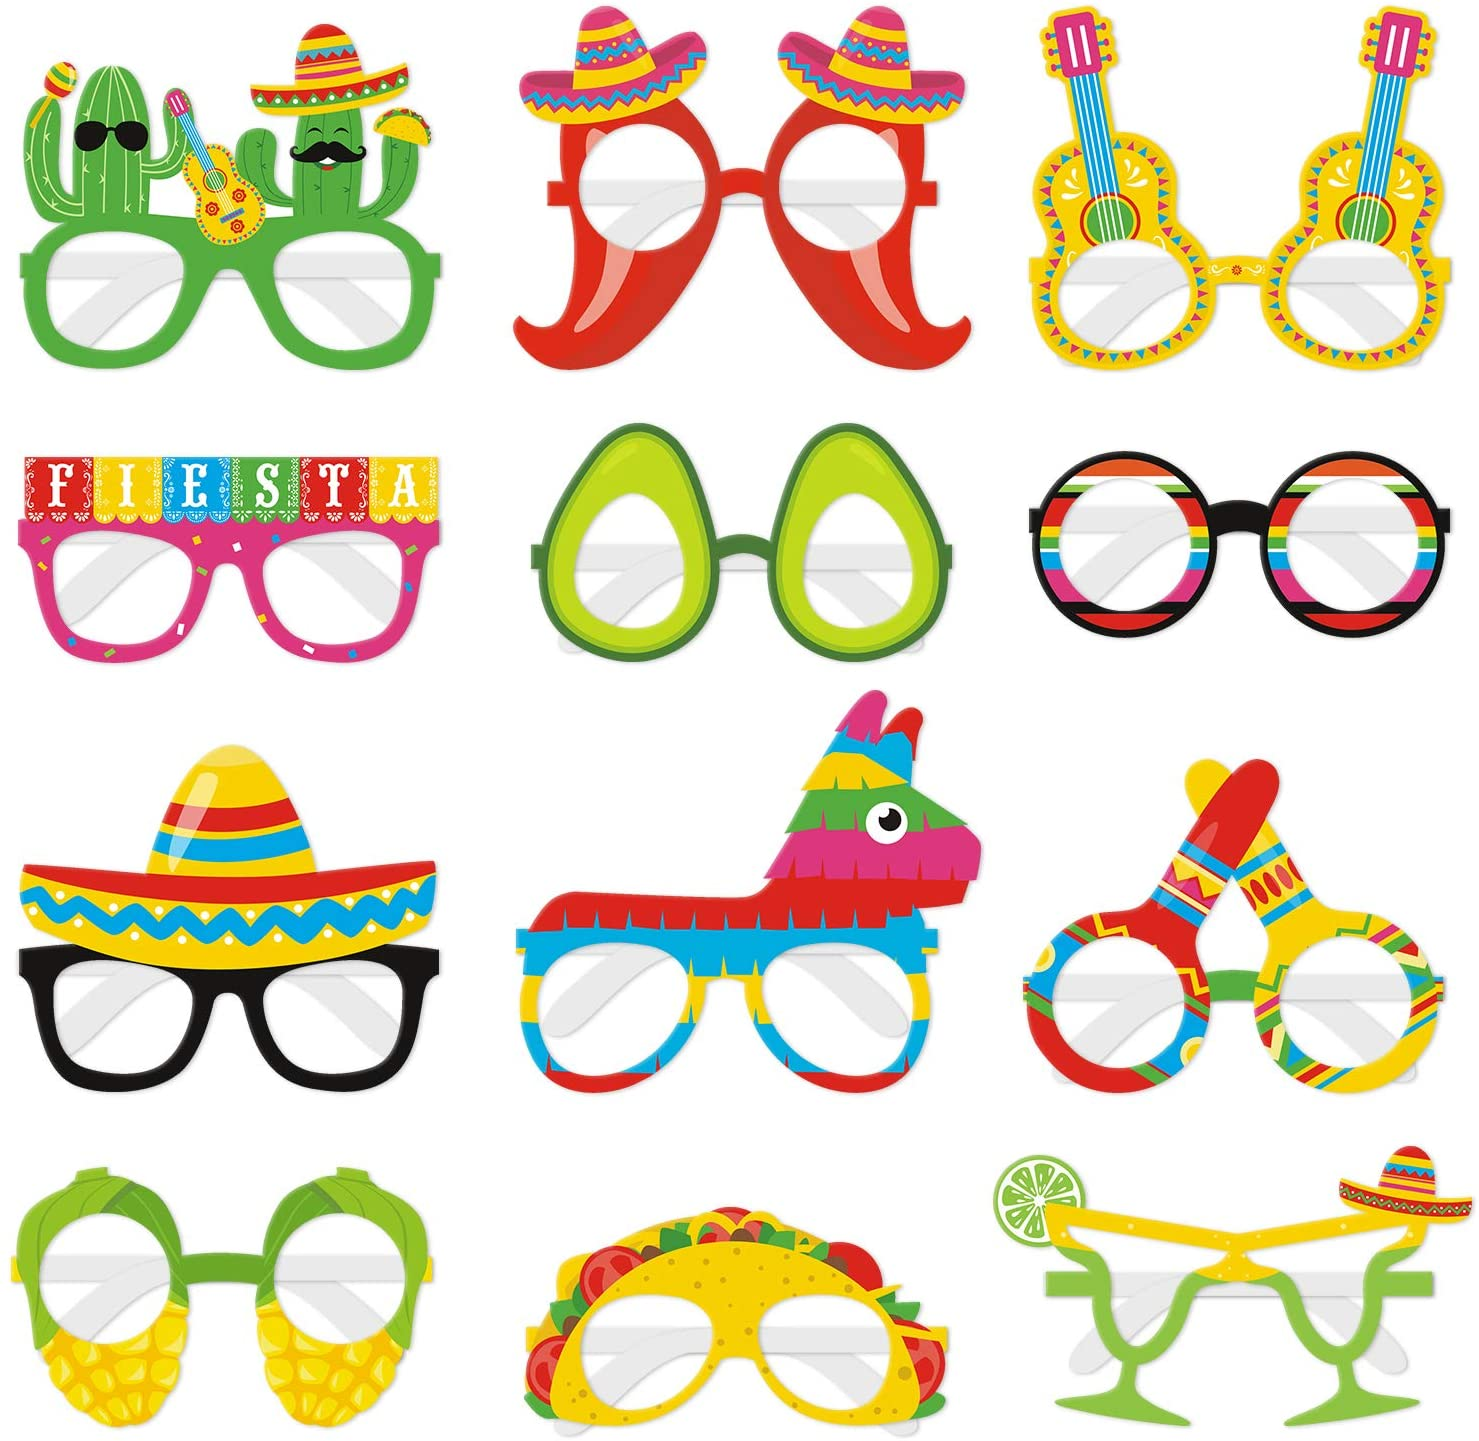 12PCS Fiesta Eyeglasses Cinco De Mayo Paper Eyewears Mexican Themed Taco Cactus Pinata Hello Avocado Photo Props Let's Fiesta Party Supplies